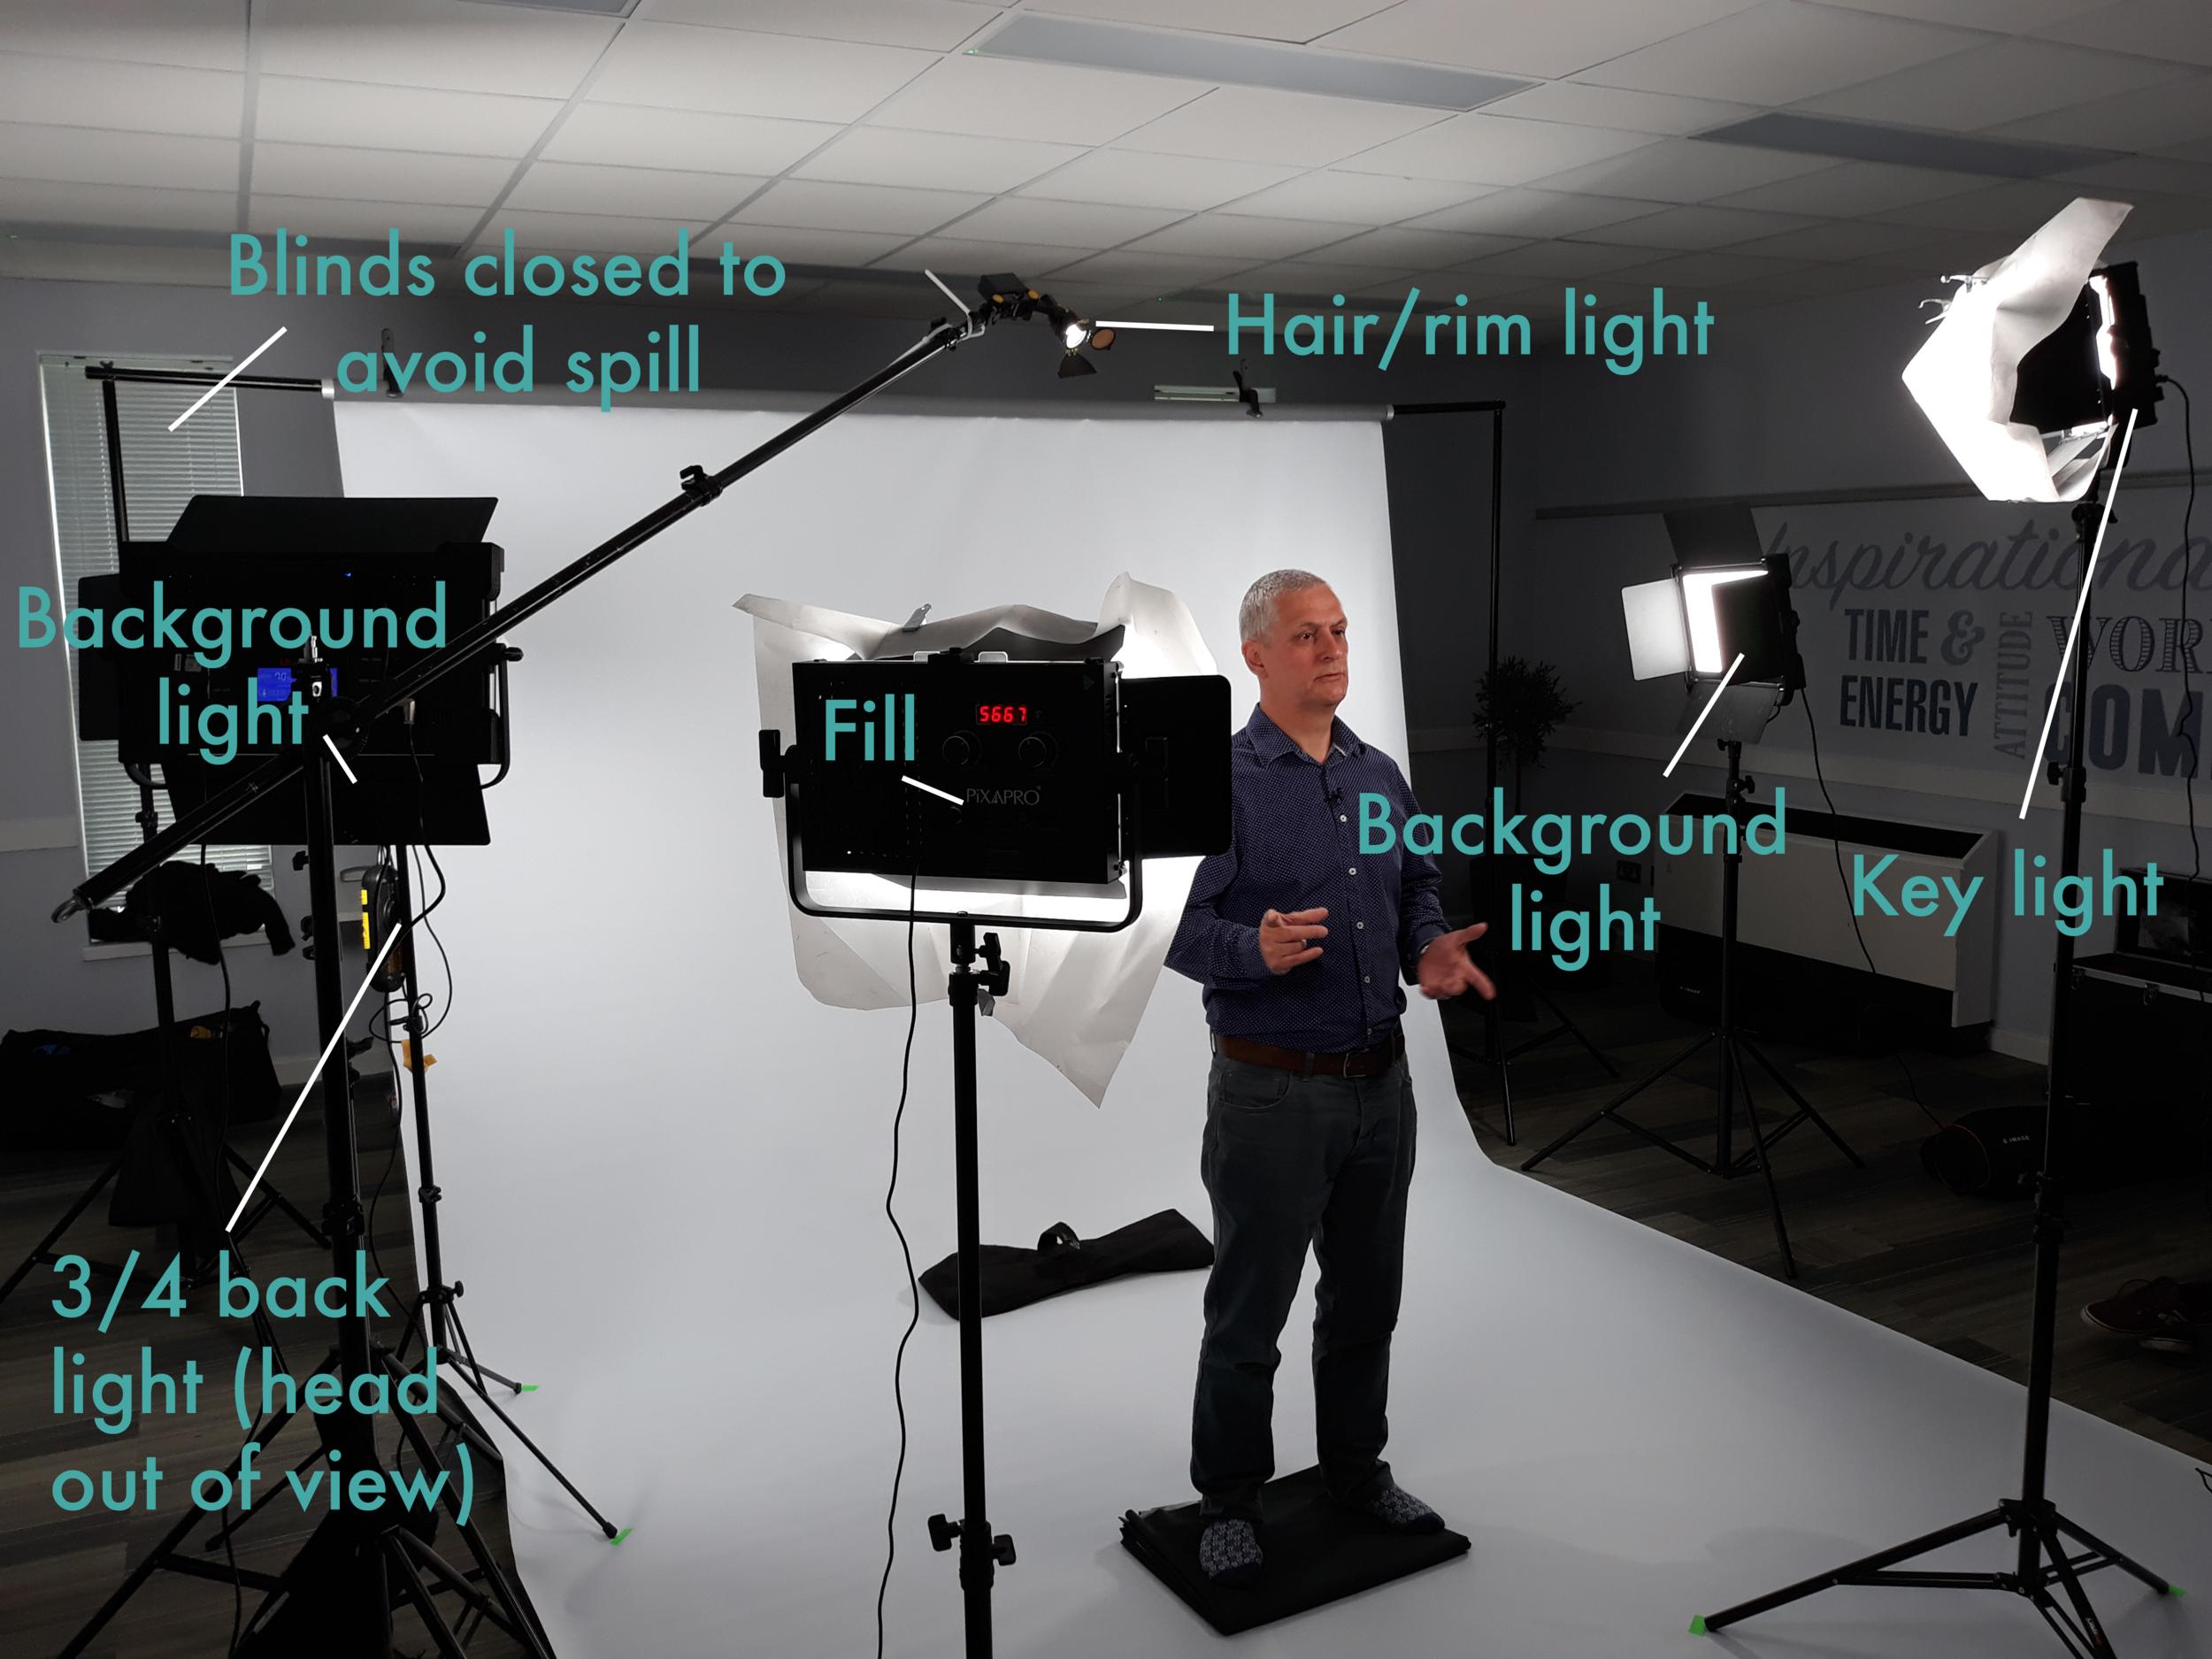 On set with the client. For you fellow lighting geeks we used the following fixtures: Key & fill: PiXAPRO VNIX LED1000B, hair/rim: Dedolight Ledzilla, 3/4 backlight: Dedo DLH4, background lights: LS Edge 1380ASVL Bi-Colour Soft LED Light